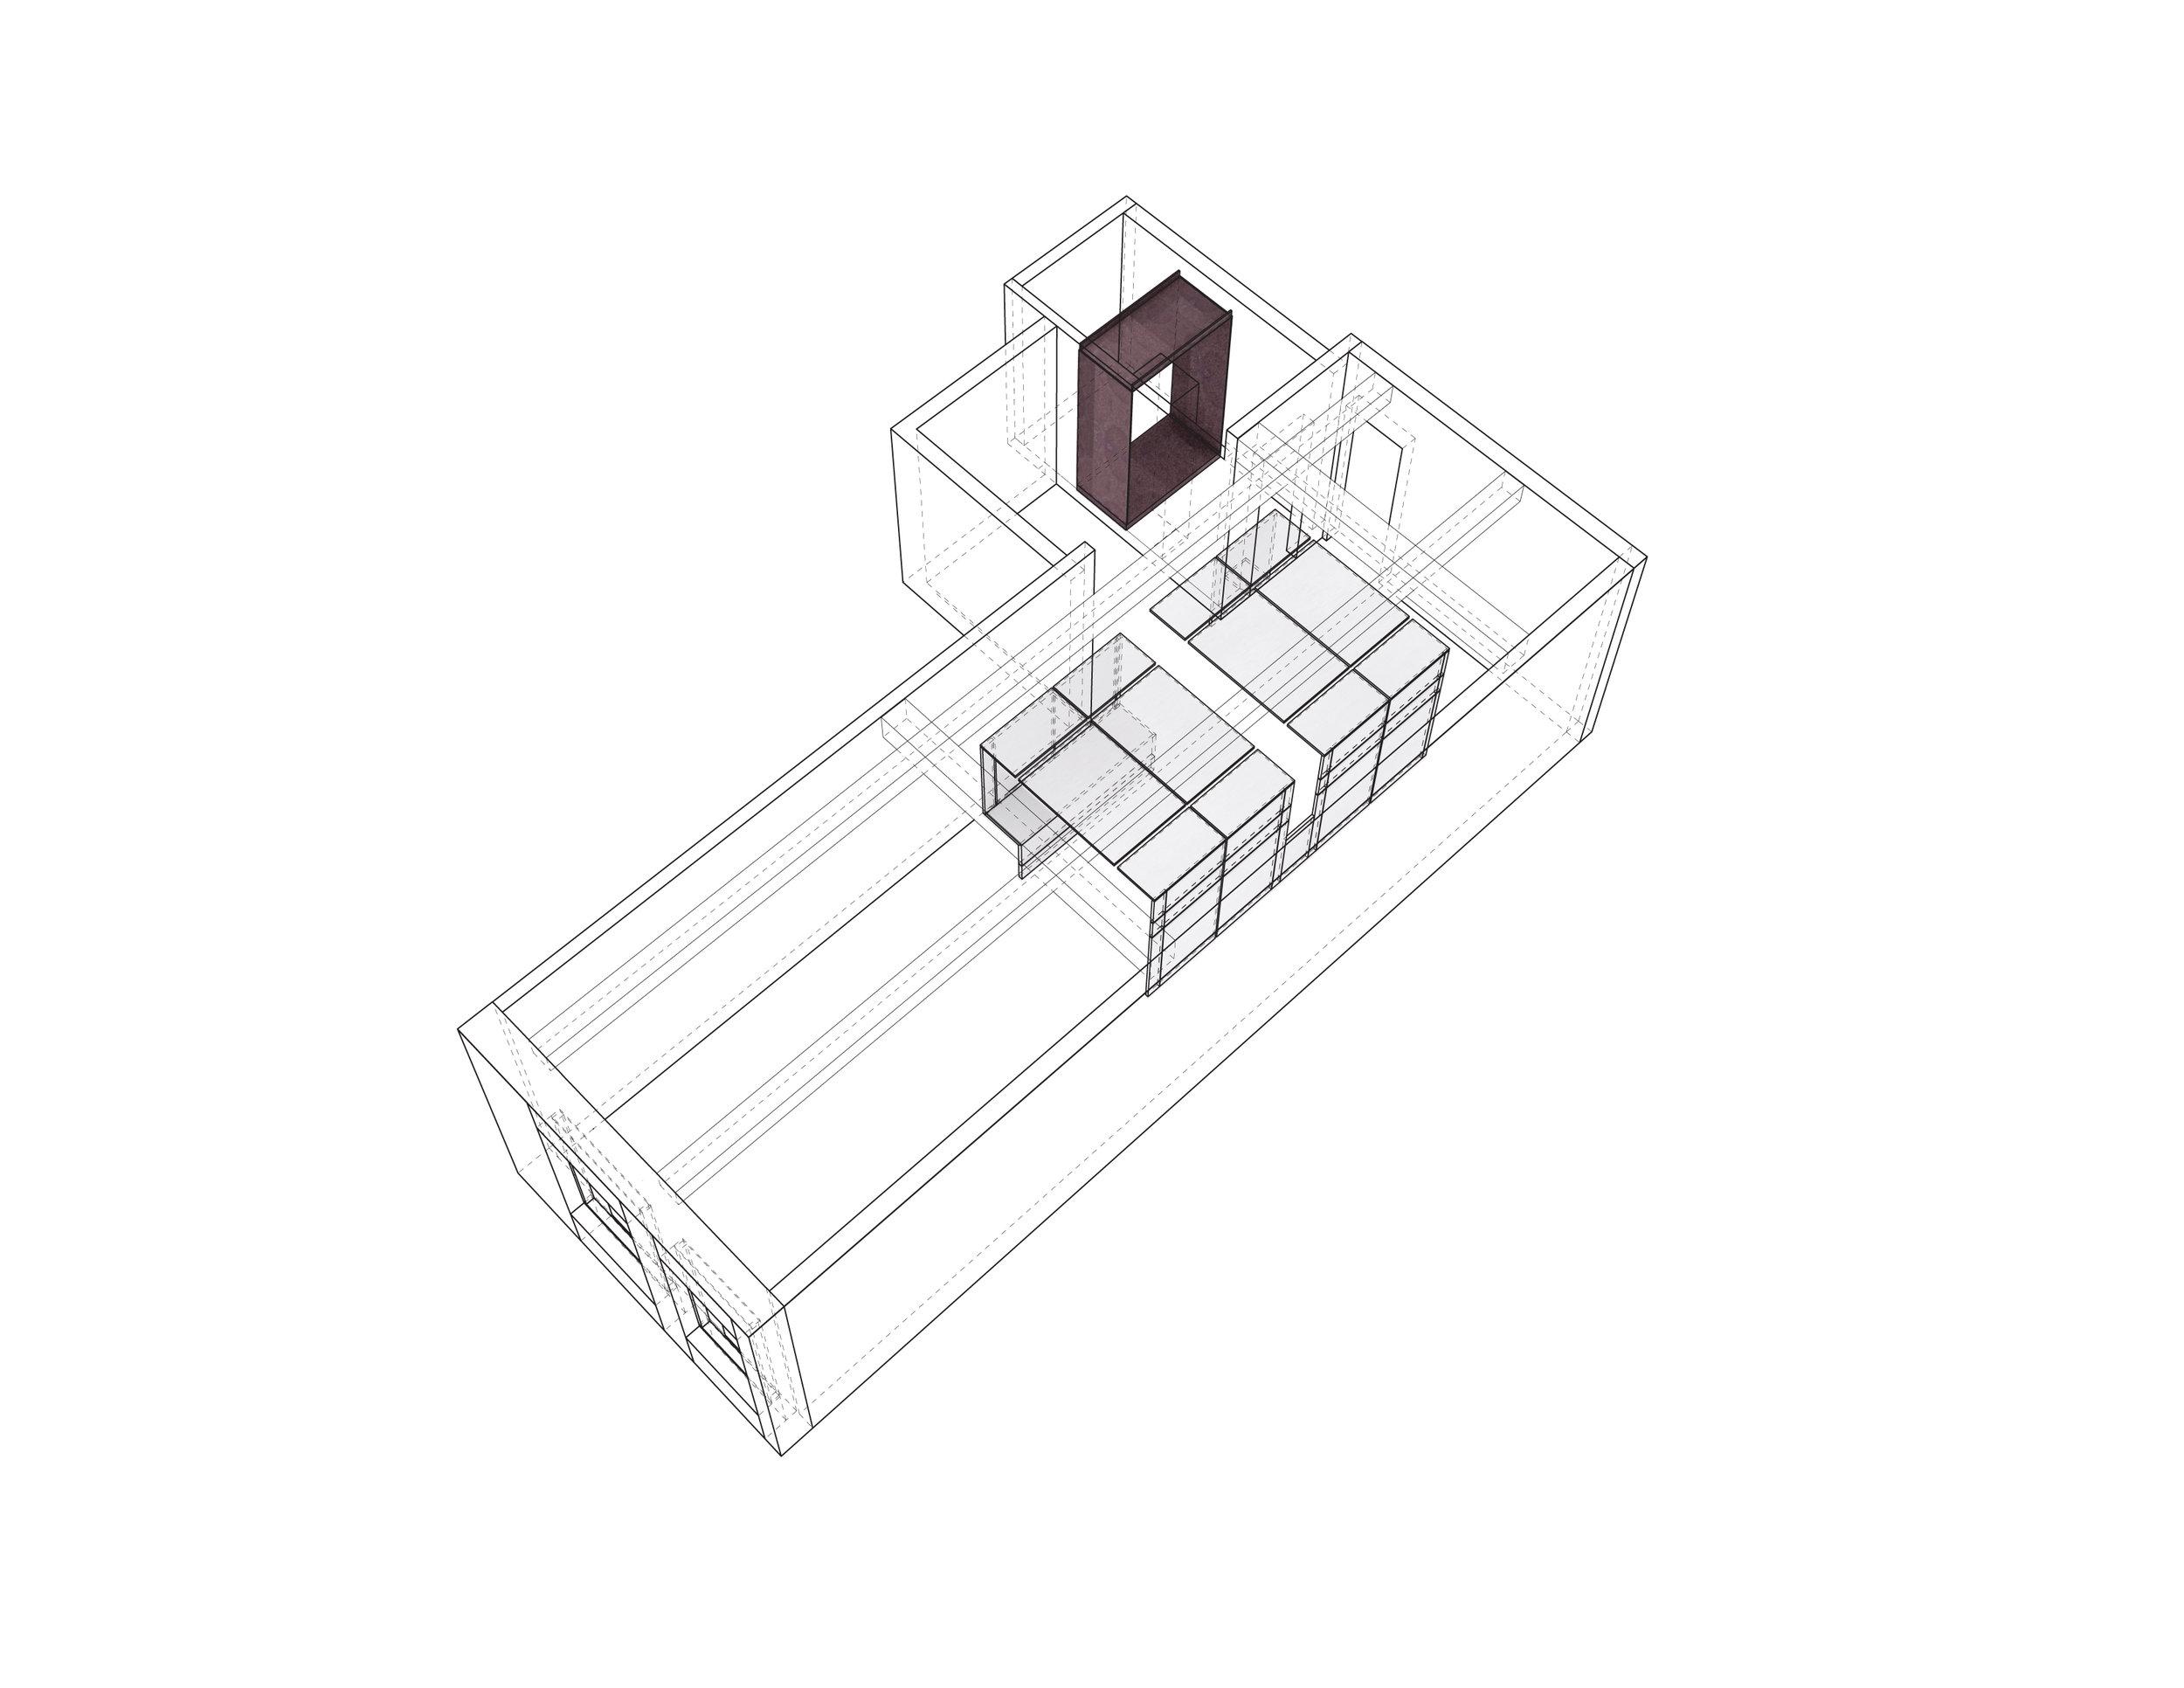 101 loft within loft 02.jpg